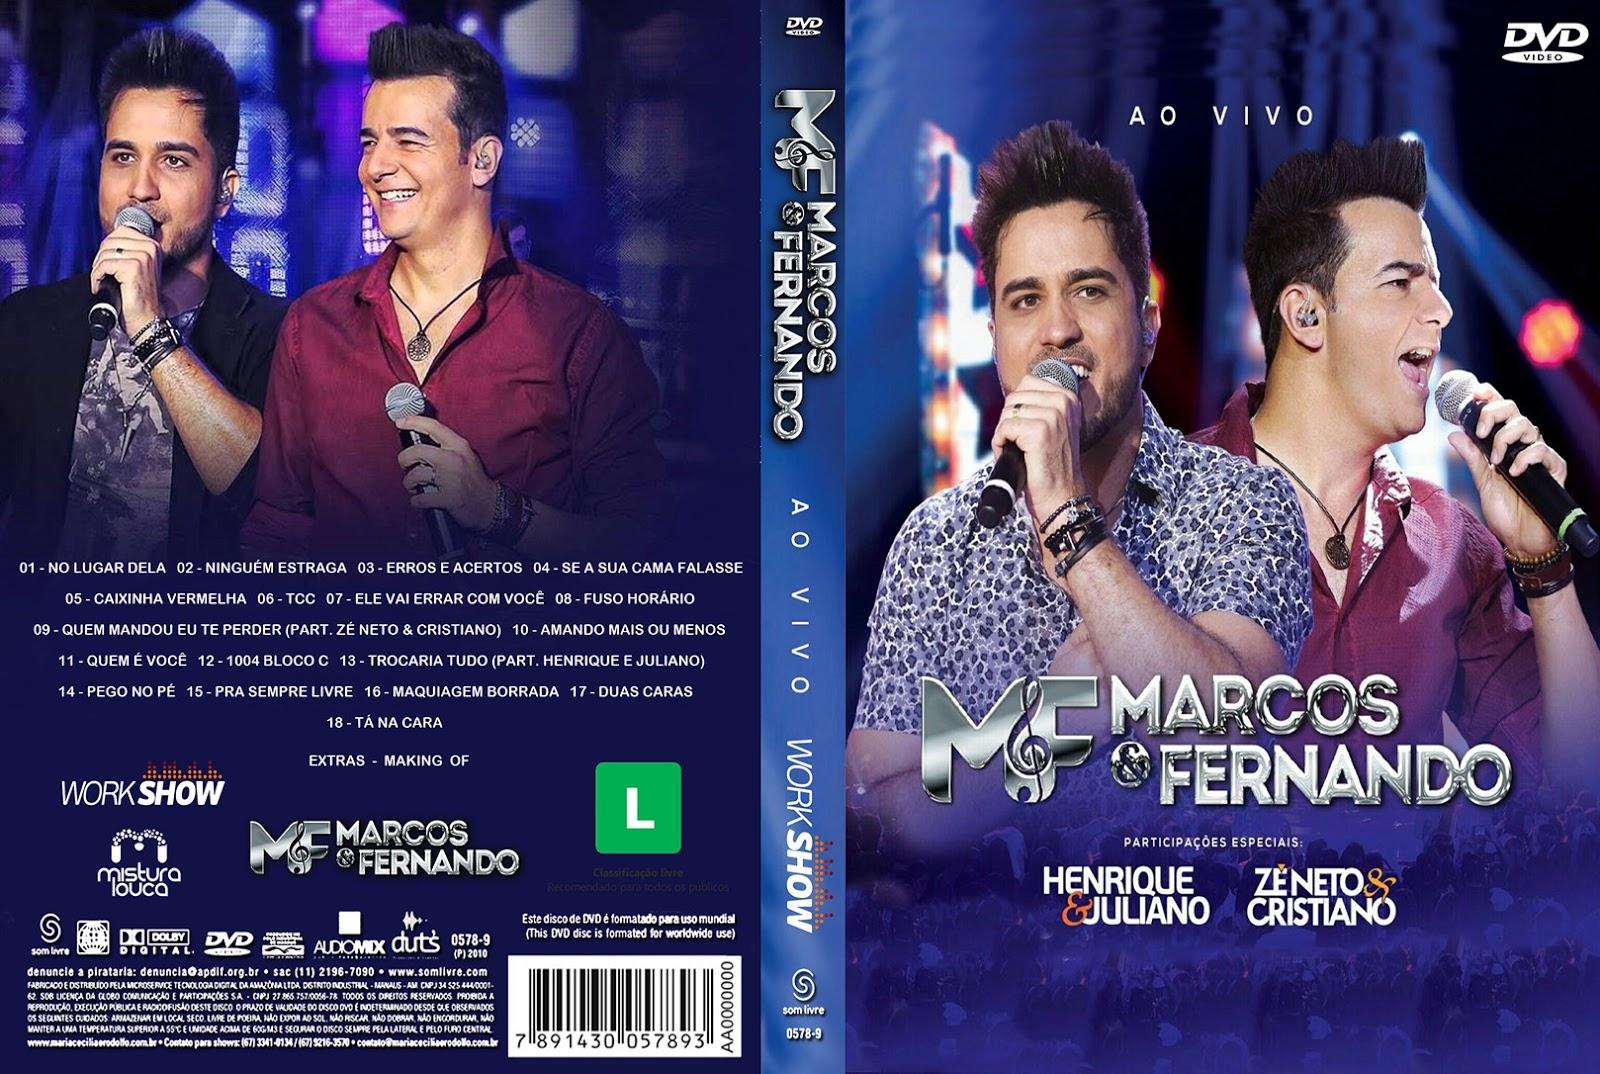 Download Marcos & Fernando DVD-R Download Marcos & Fernando DVD-R Marcos 2Be 2BFernando 2B  2BXANDAODOWNLOAD